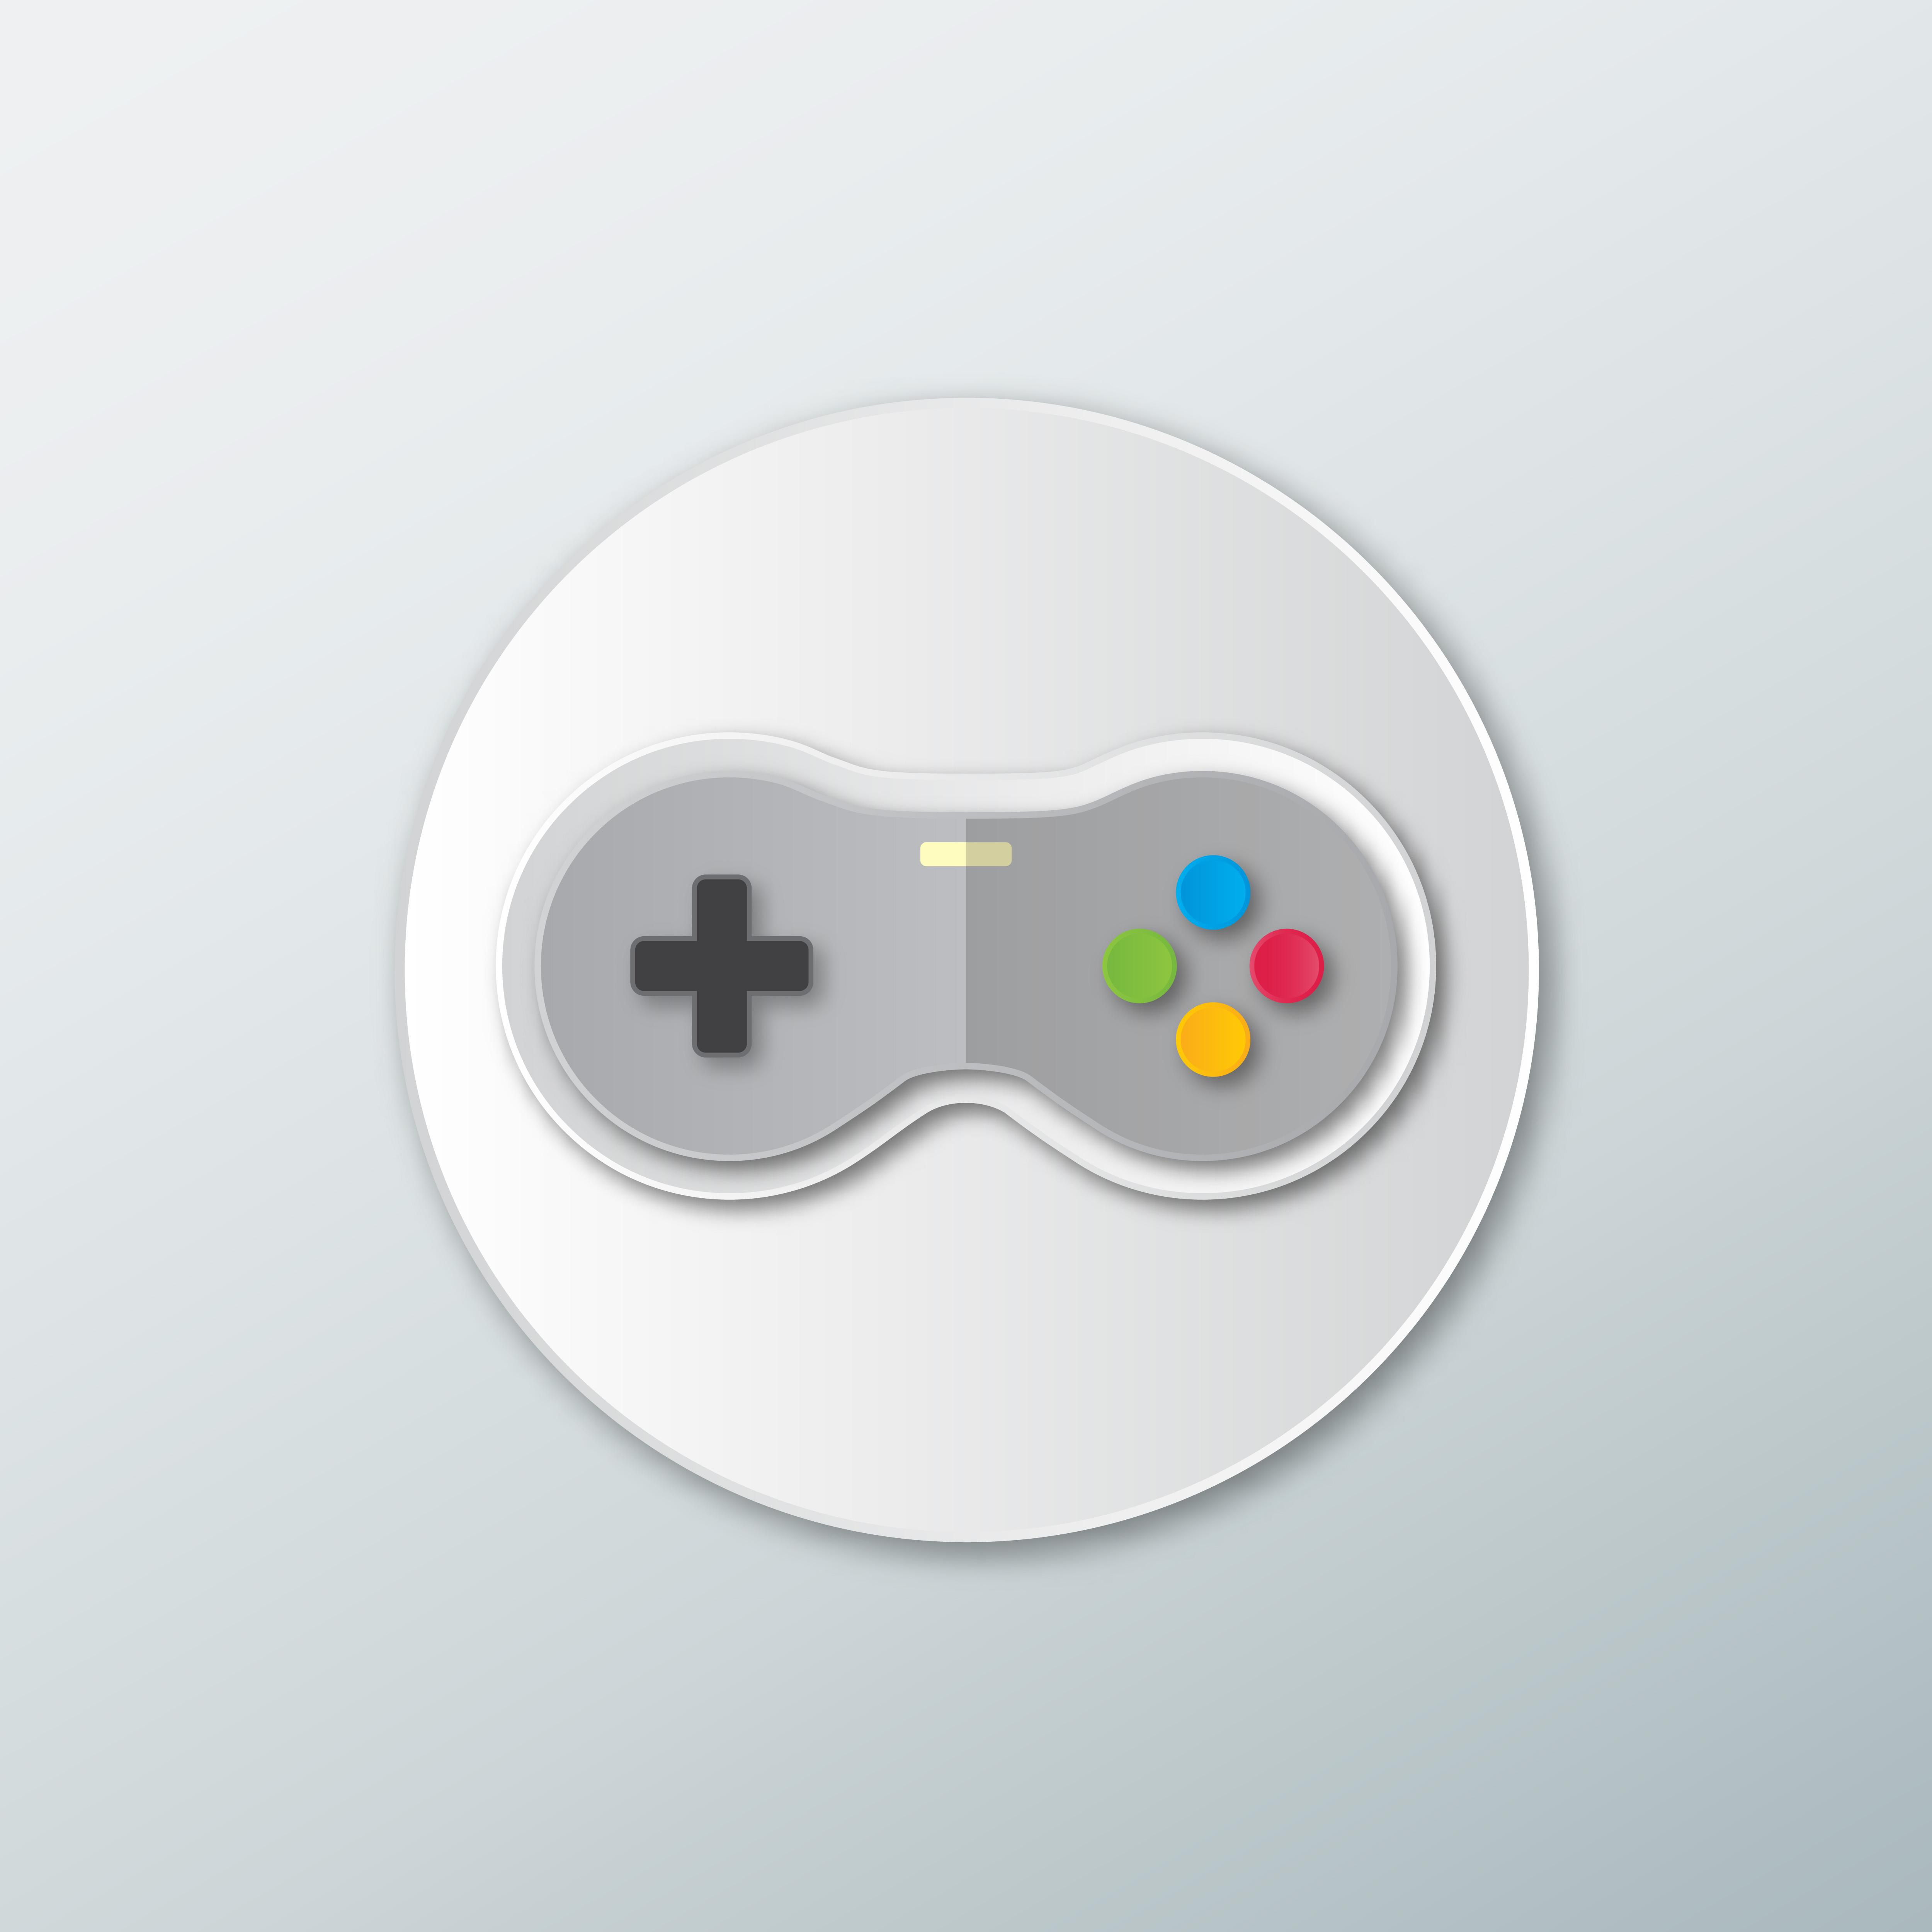 icon joystick for games .Gamepad..